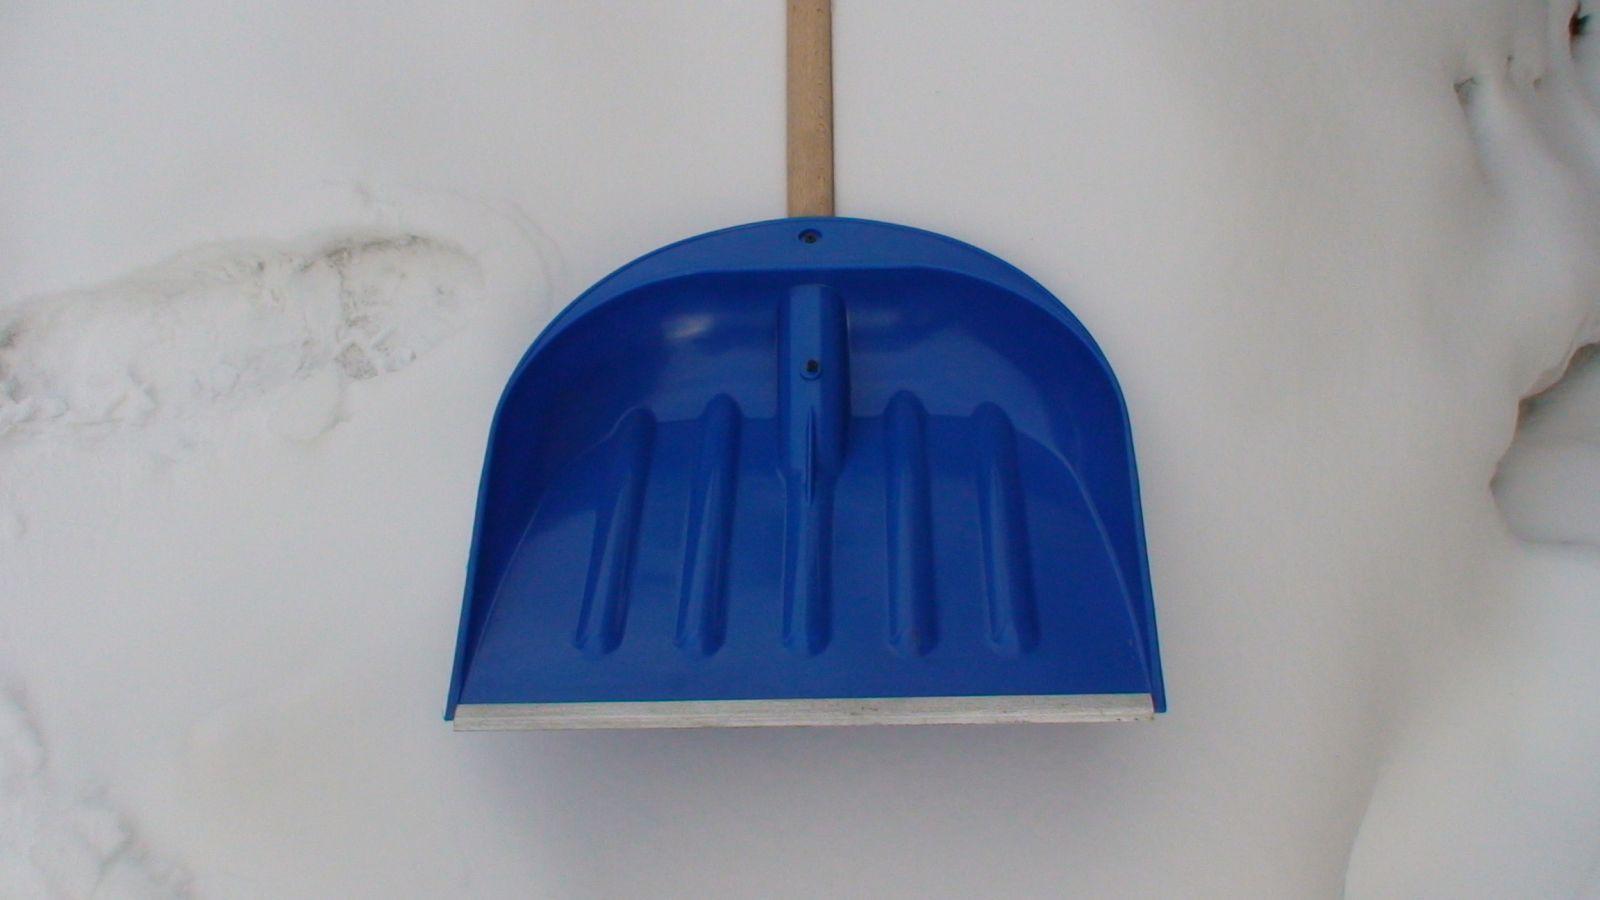 Лопата для уборки снега, скребки для быстрой чистки территории 16